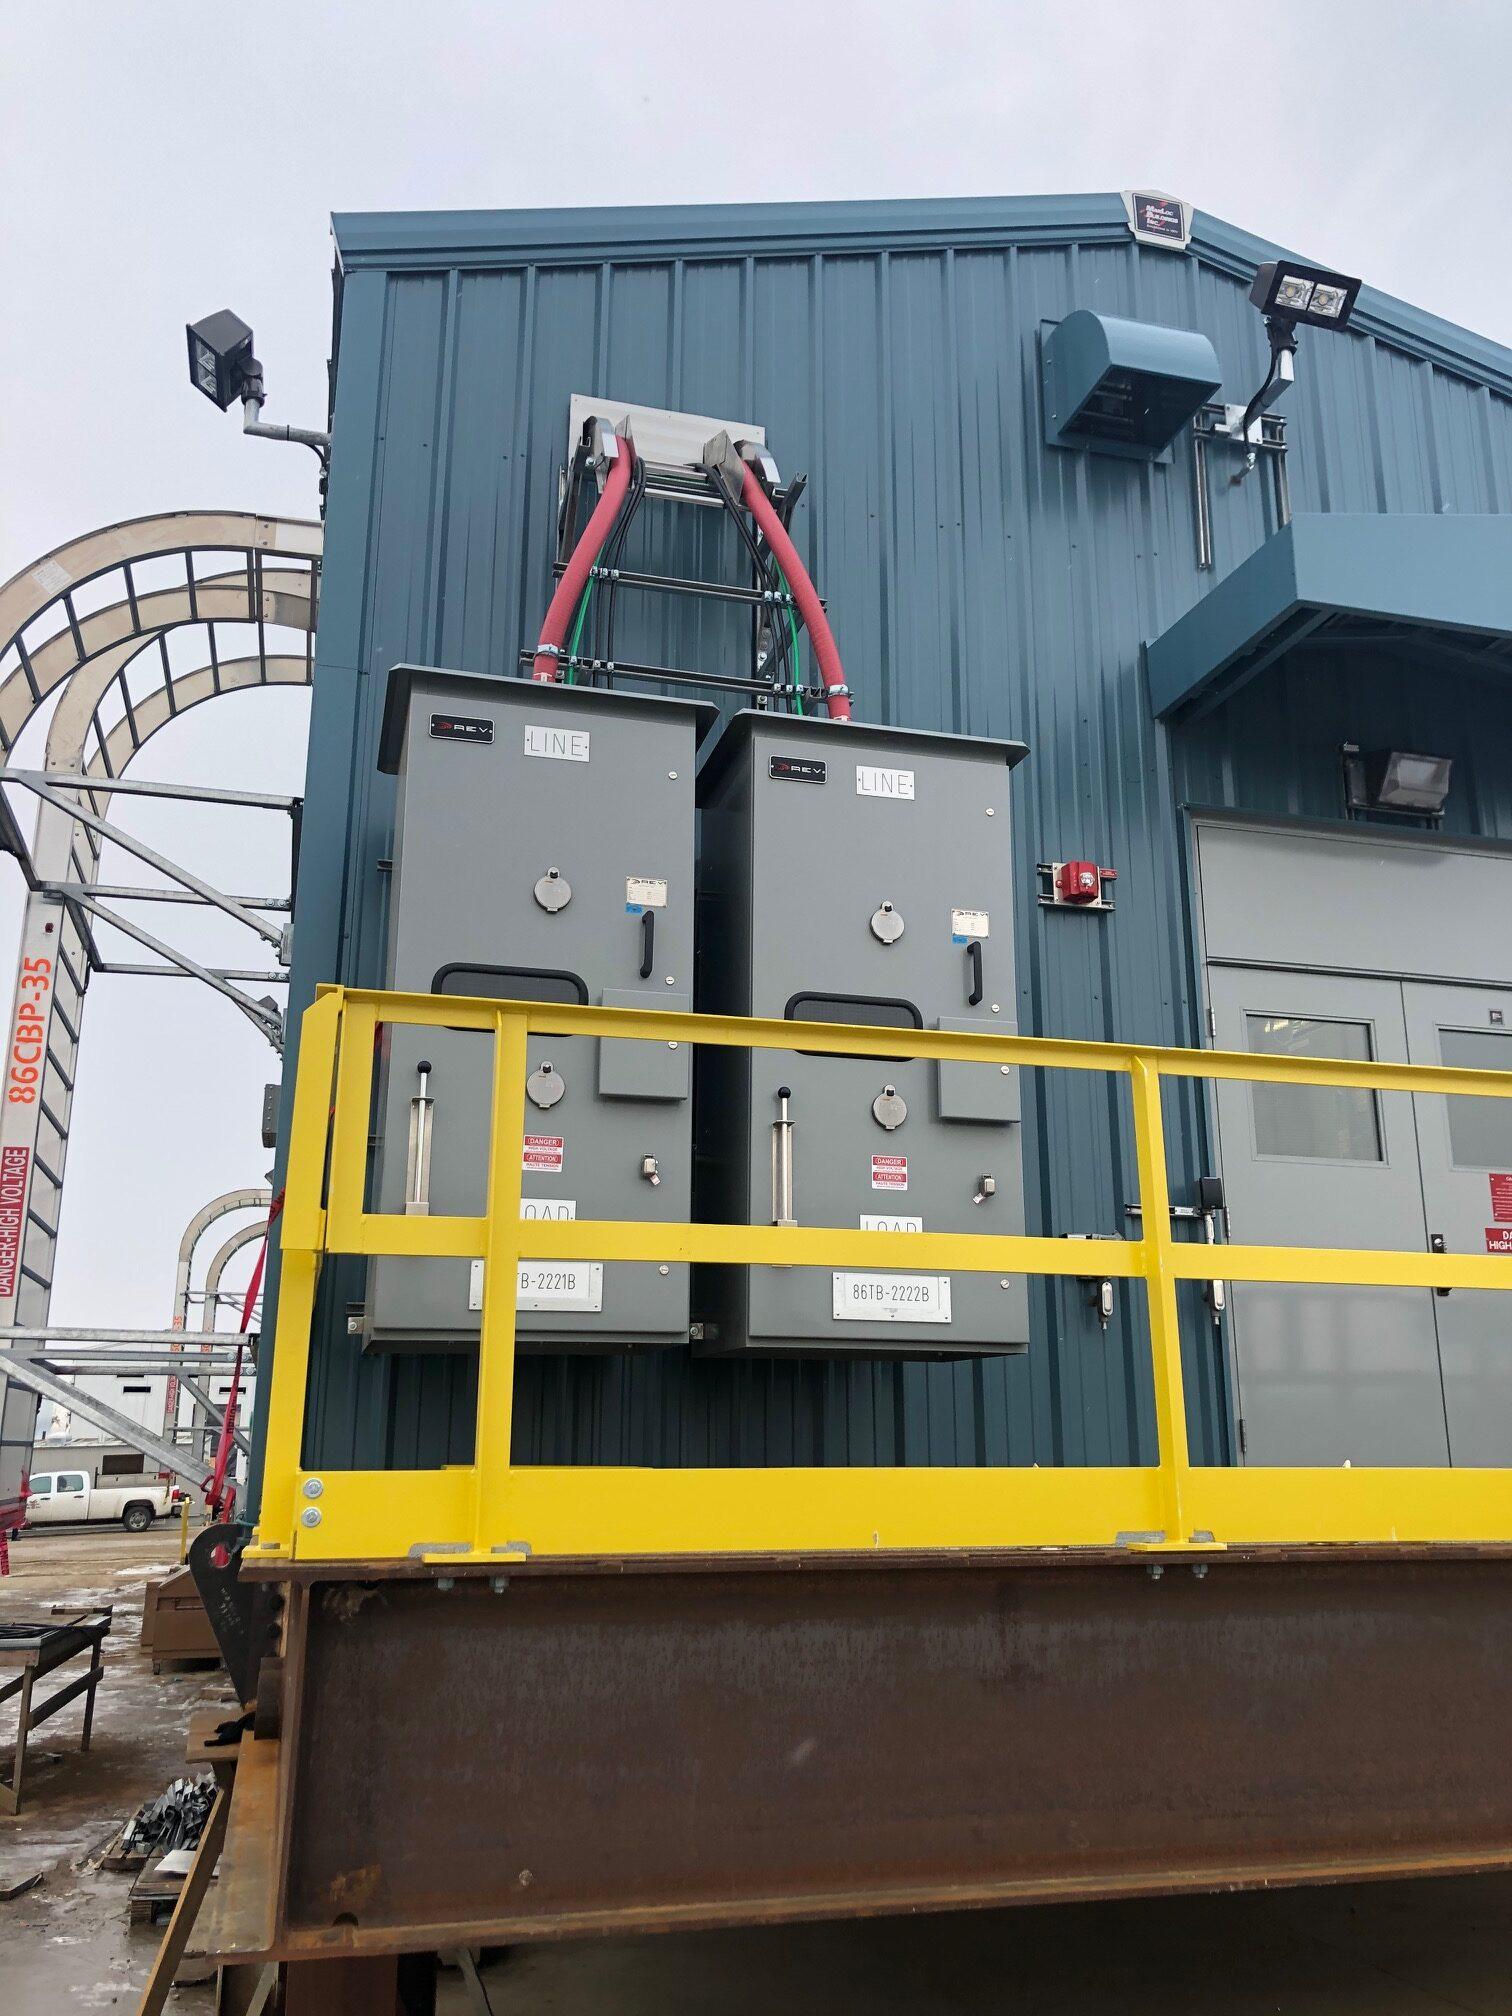 Siemens – Edmonton